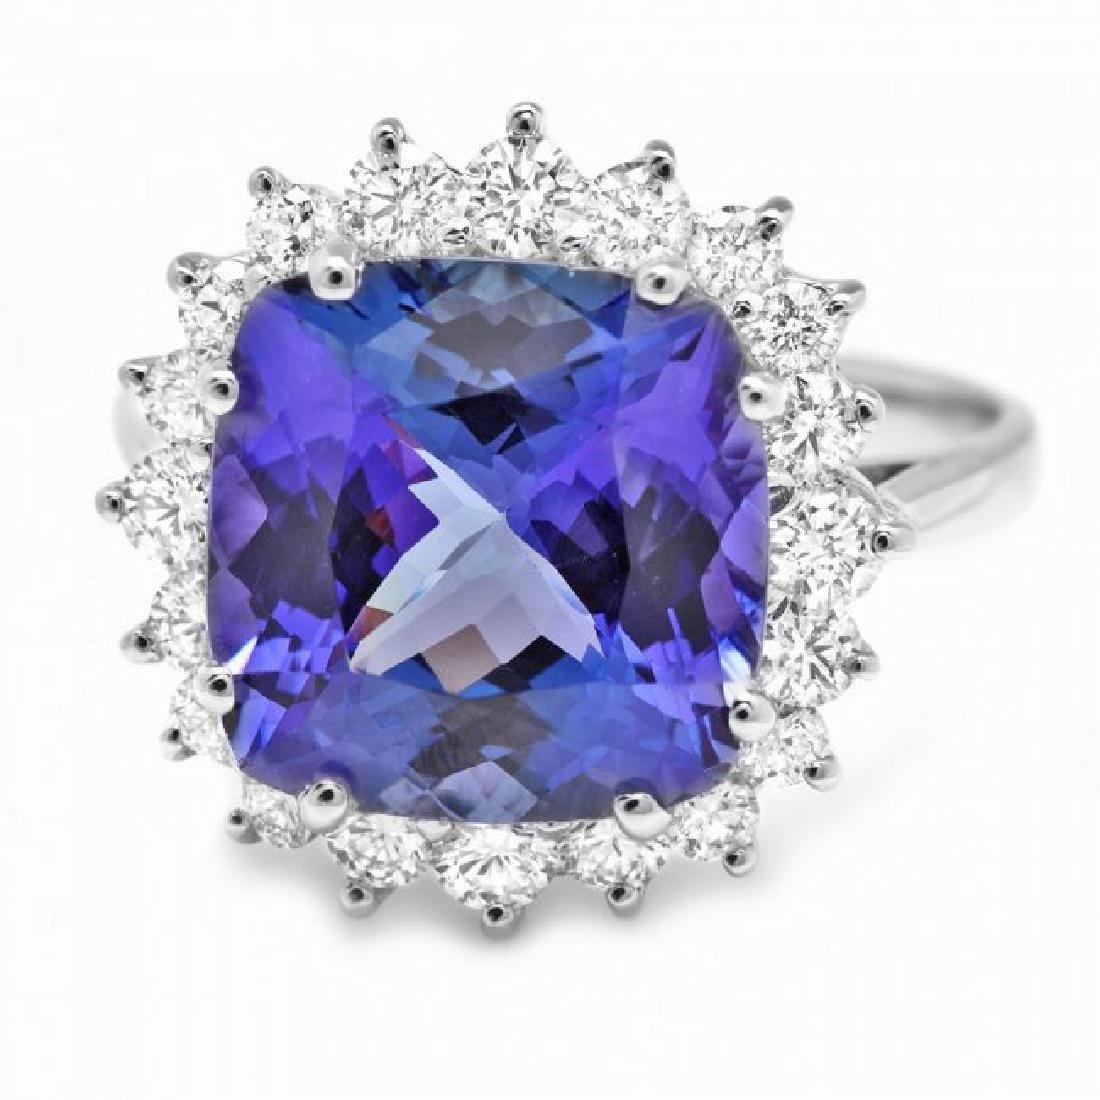 14k Gold 5.50ct Tanzanite 0.80ct Diamond Ring - 2